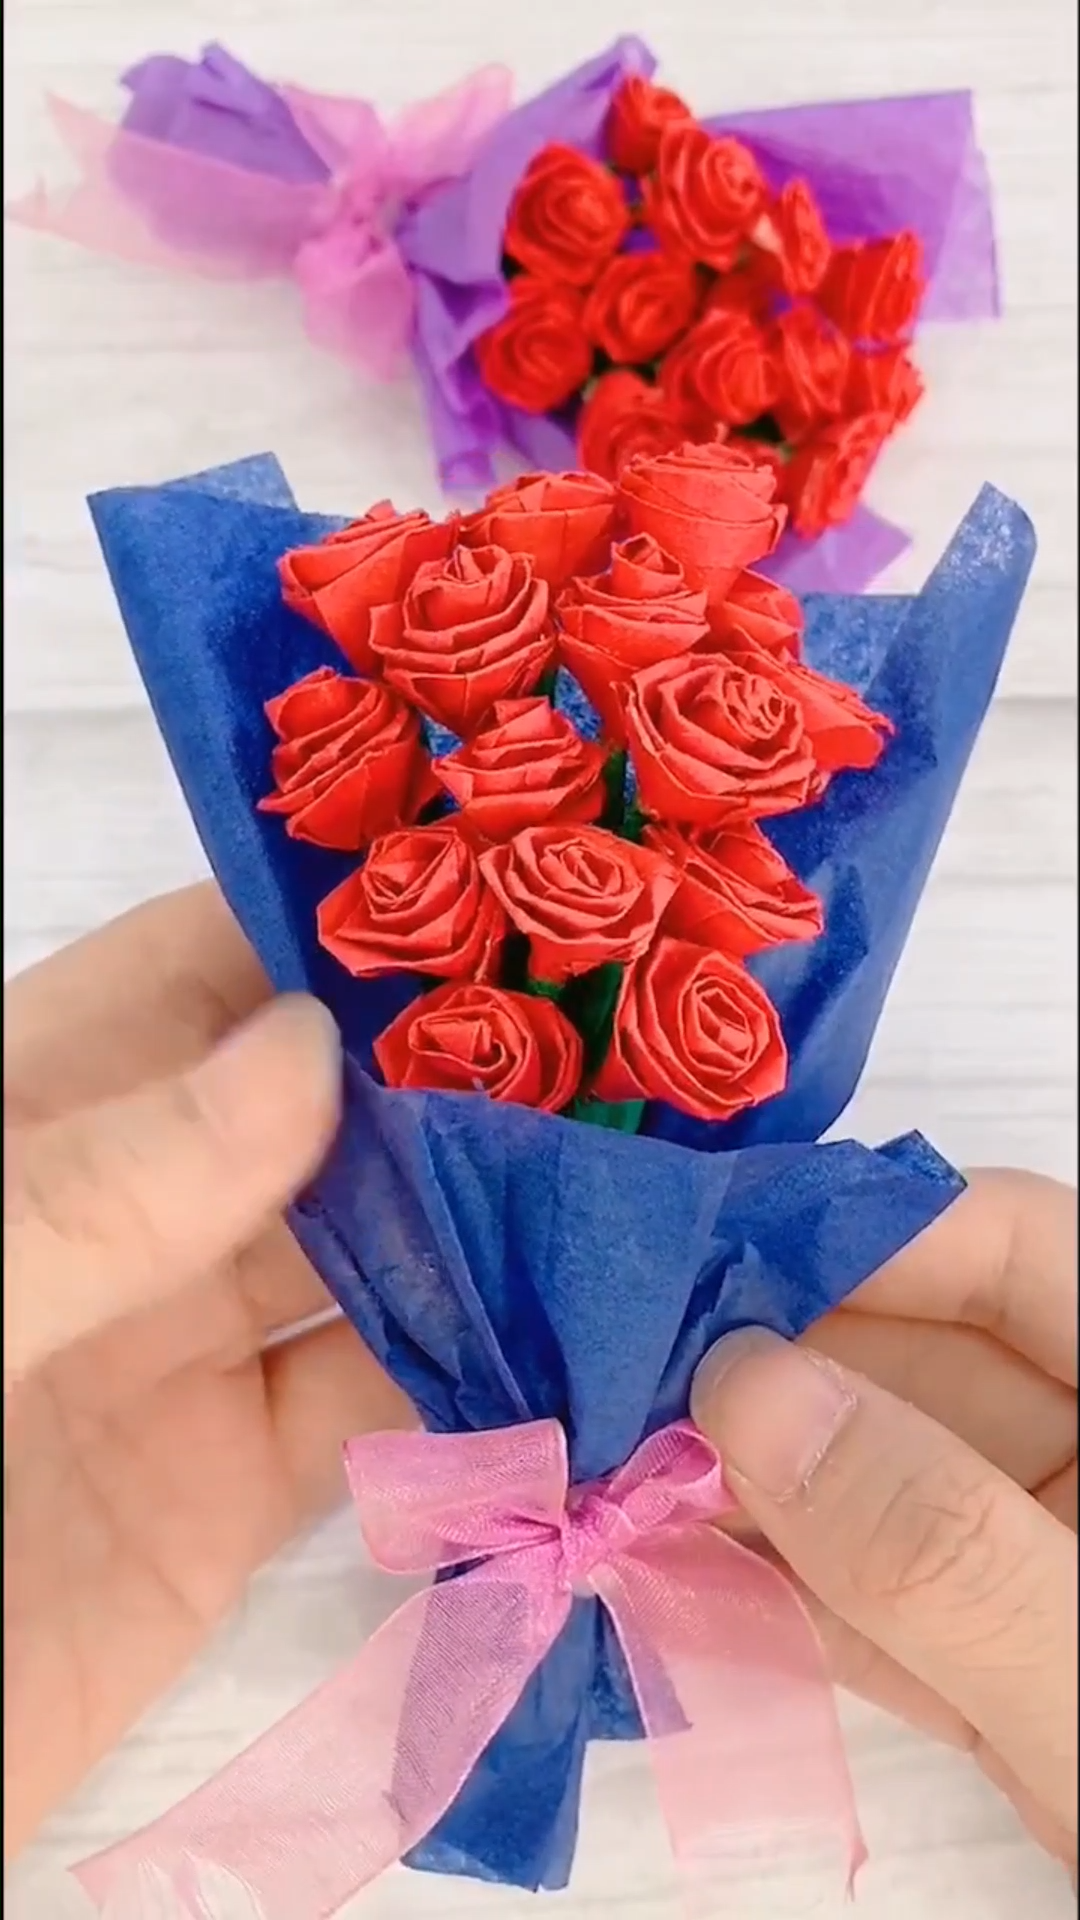 DIY Paper Flower Zeugen Sie Papier Rose Bukett, #Bukett #DIY #Flower #Paper #Papier #Rose #Sie #zeugen, #DiyAbschnitt, Diy Abschnitt,